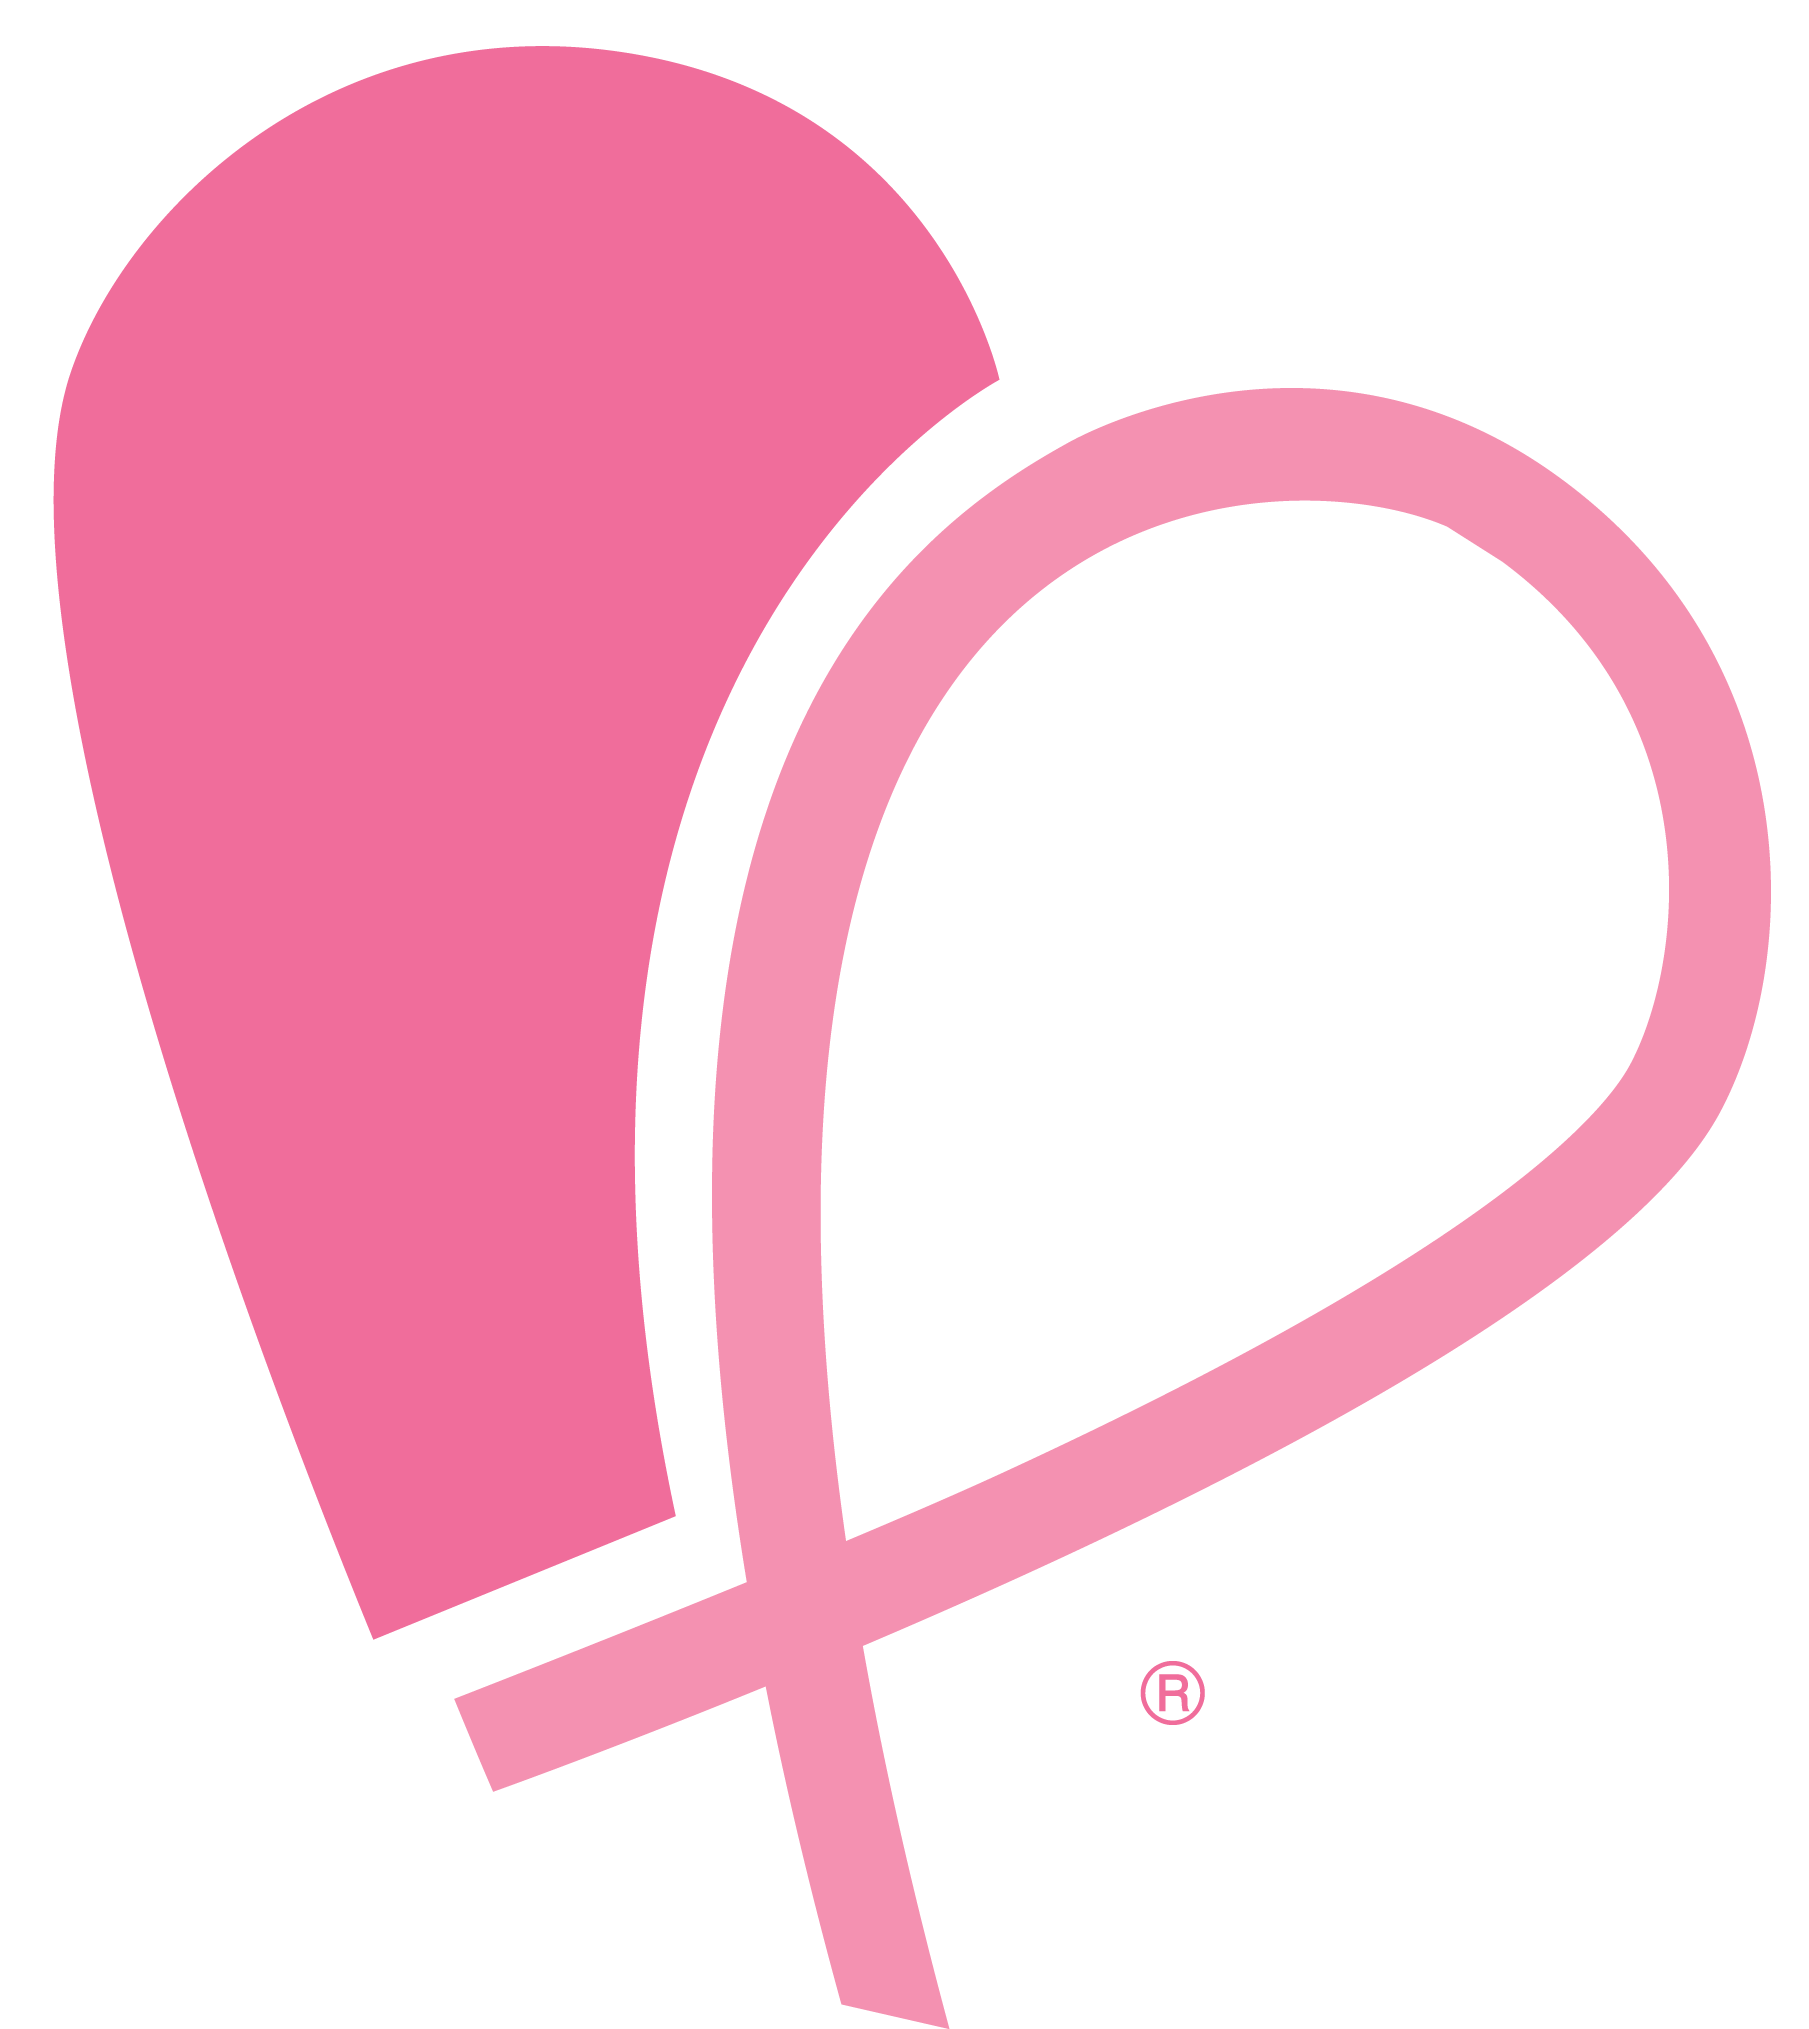 pf-heart-ribbon-212.png